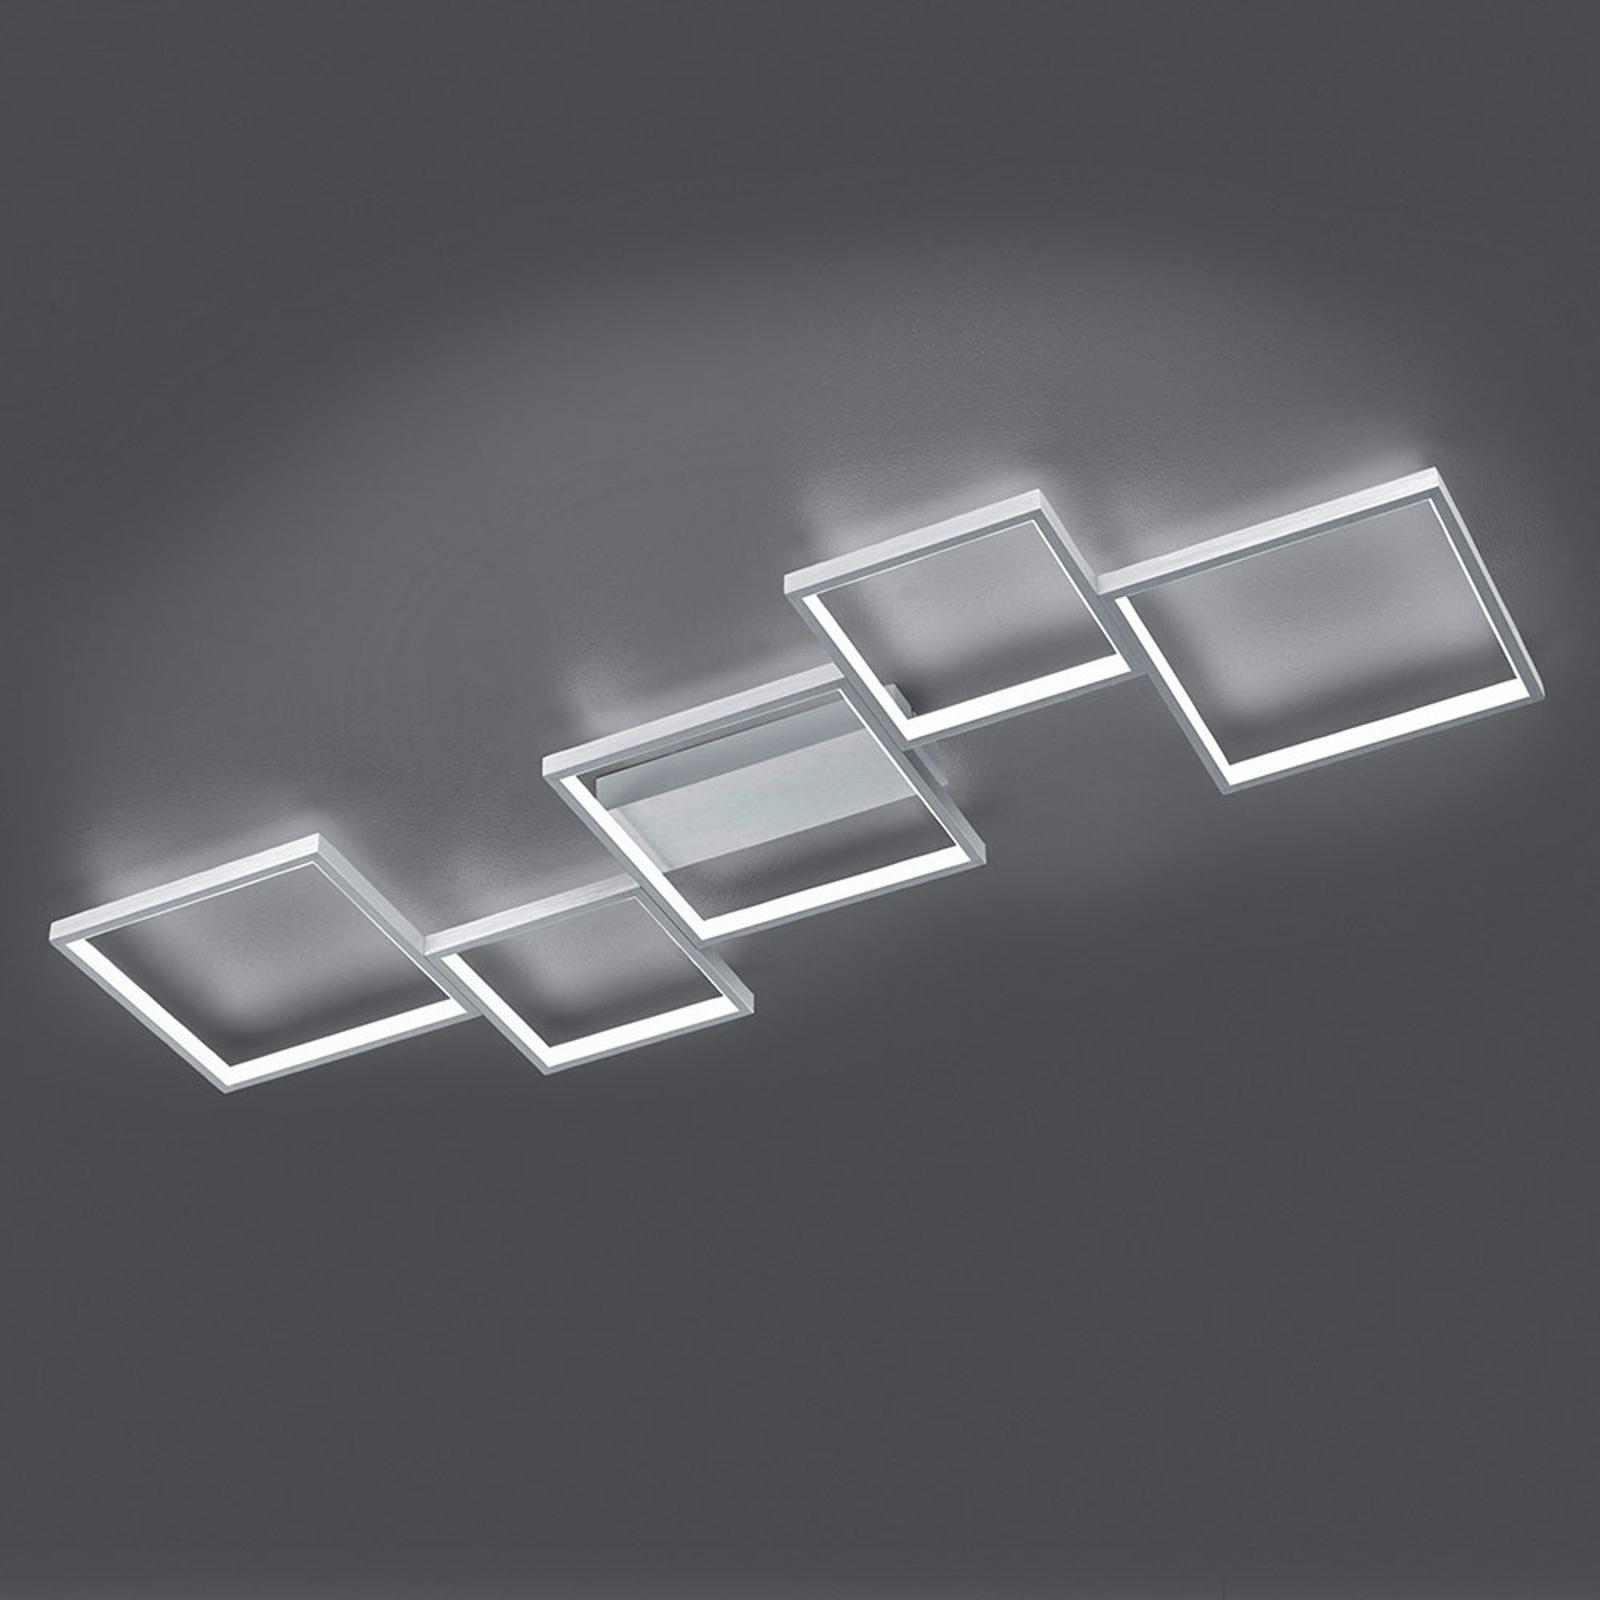 LED-kattovalo Sorrento 120x48cm, harjattu alumiini